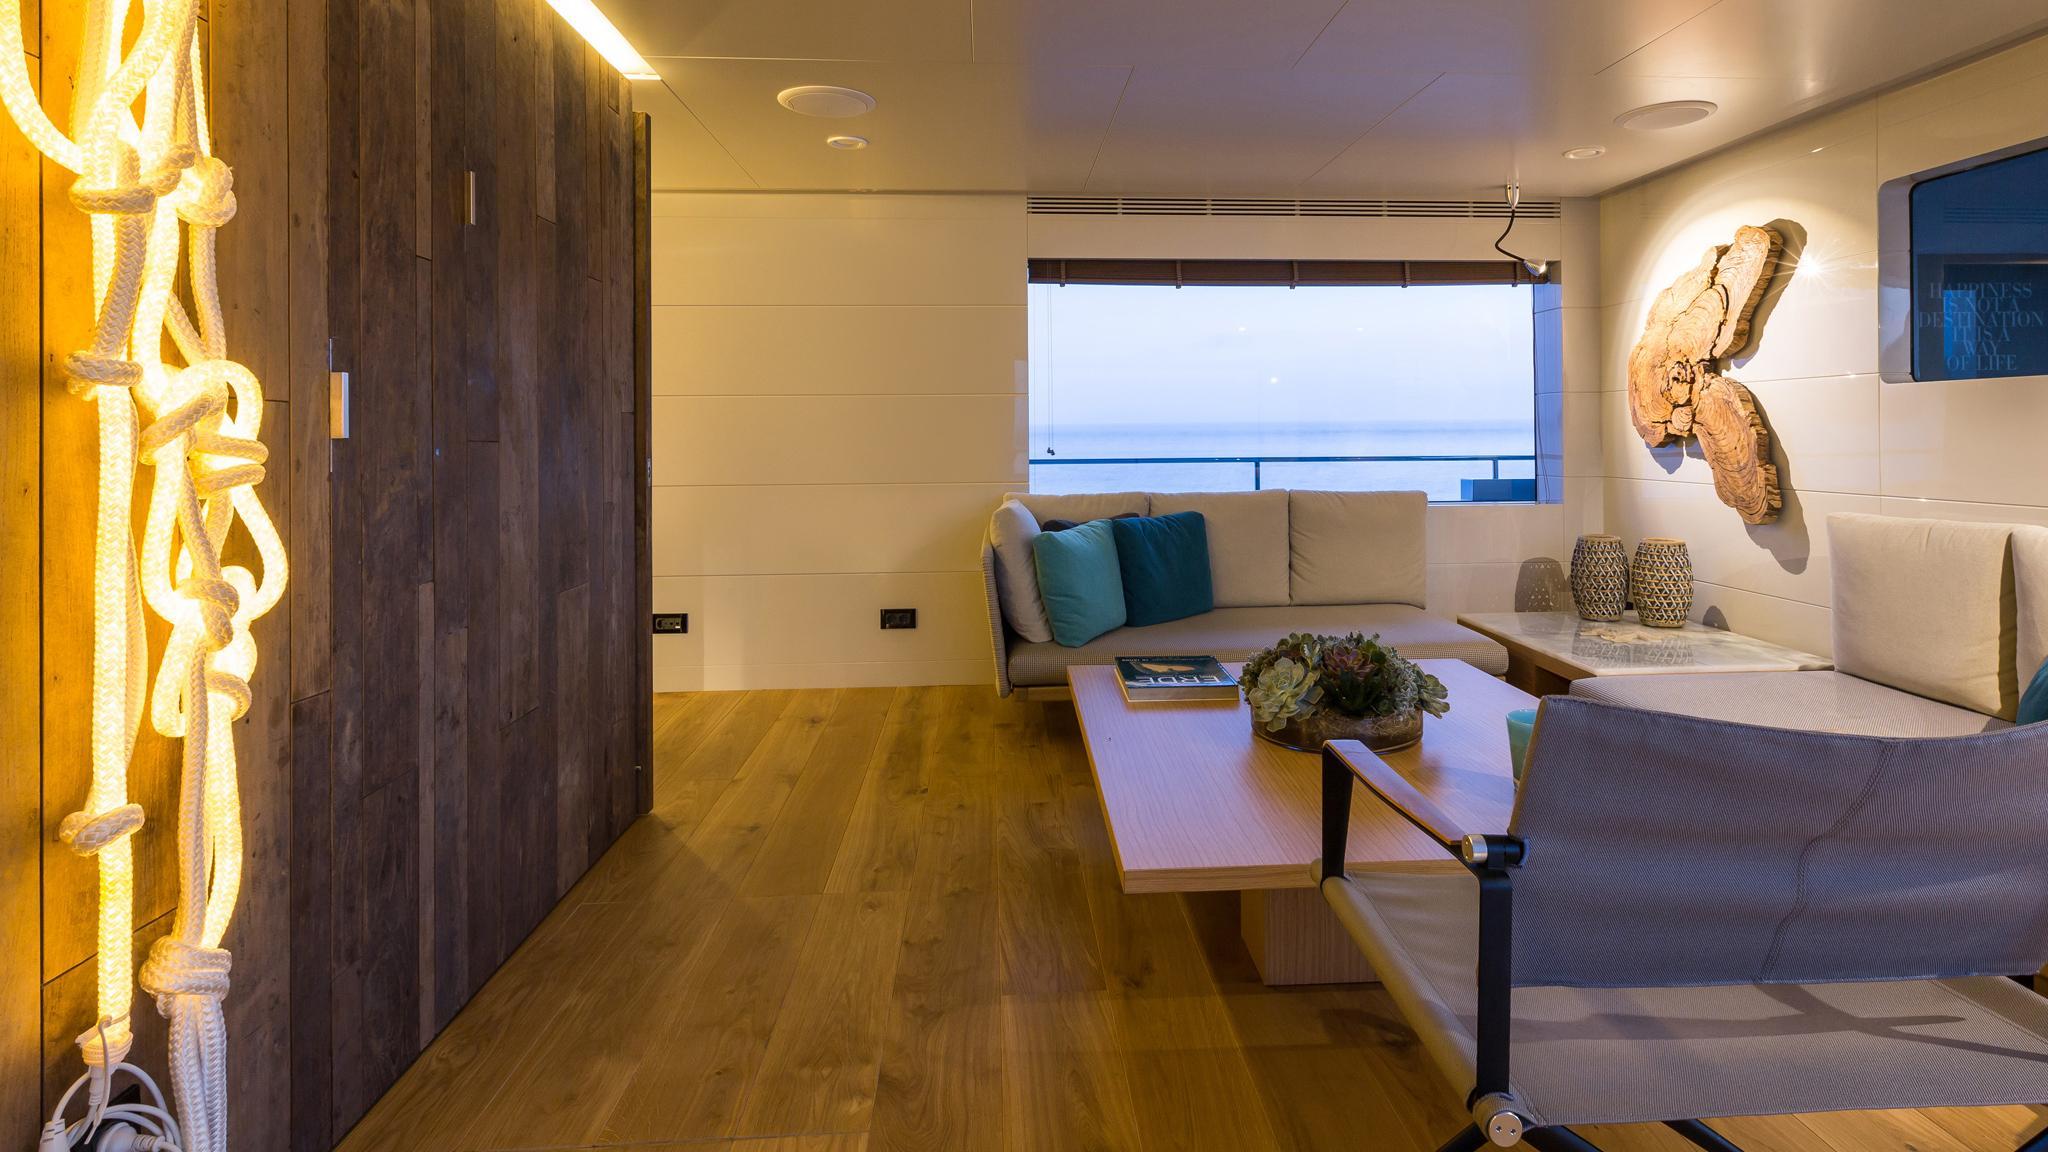 so-mar-motor-yacht-tansu-2014-38m-saloon